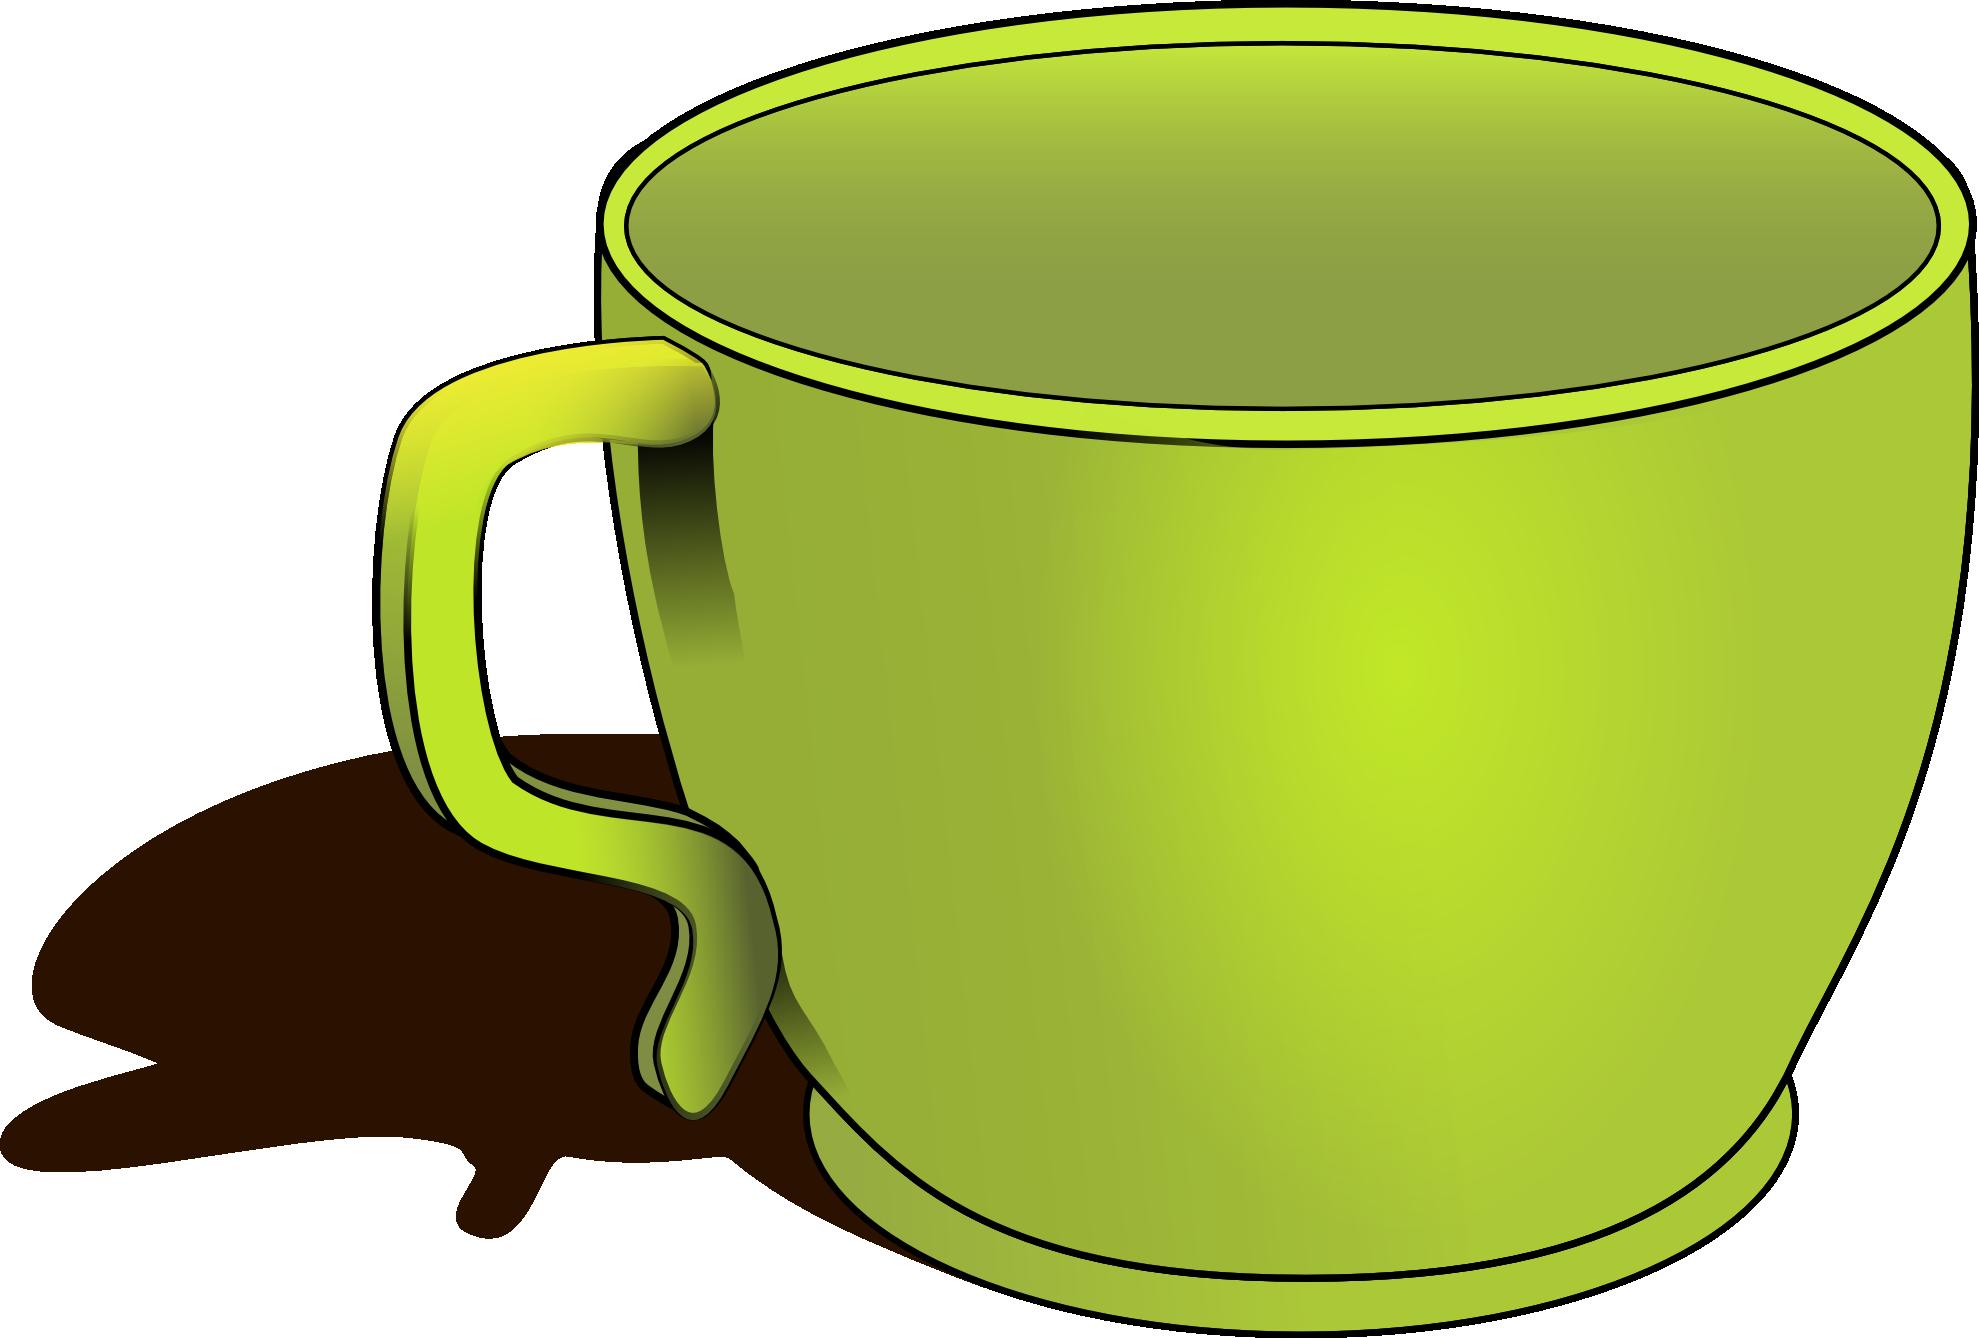 Mug clipart cup plate Panda Clipart Clipart cup%20clipart Clipart